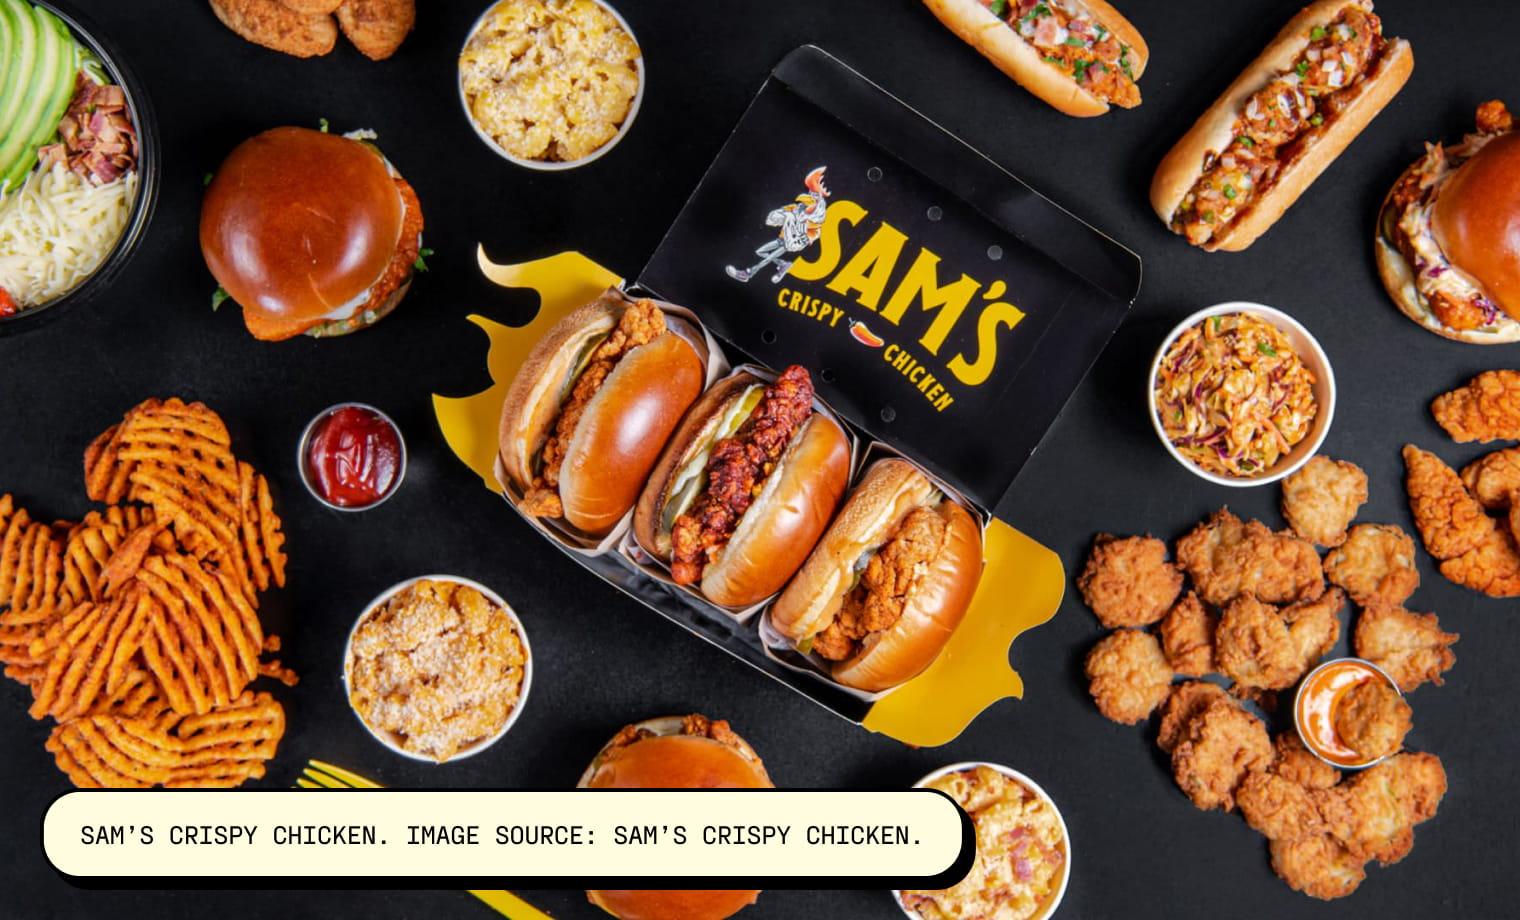 Sam's Crispy Chicken. Image Source: Sam's Crispy Chicken.